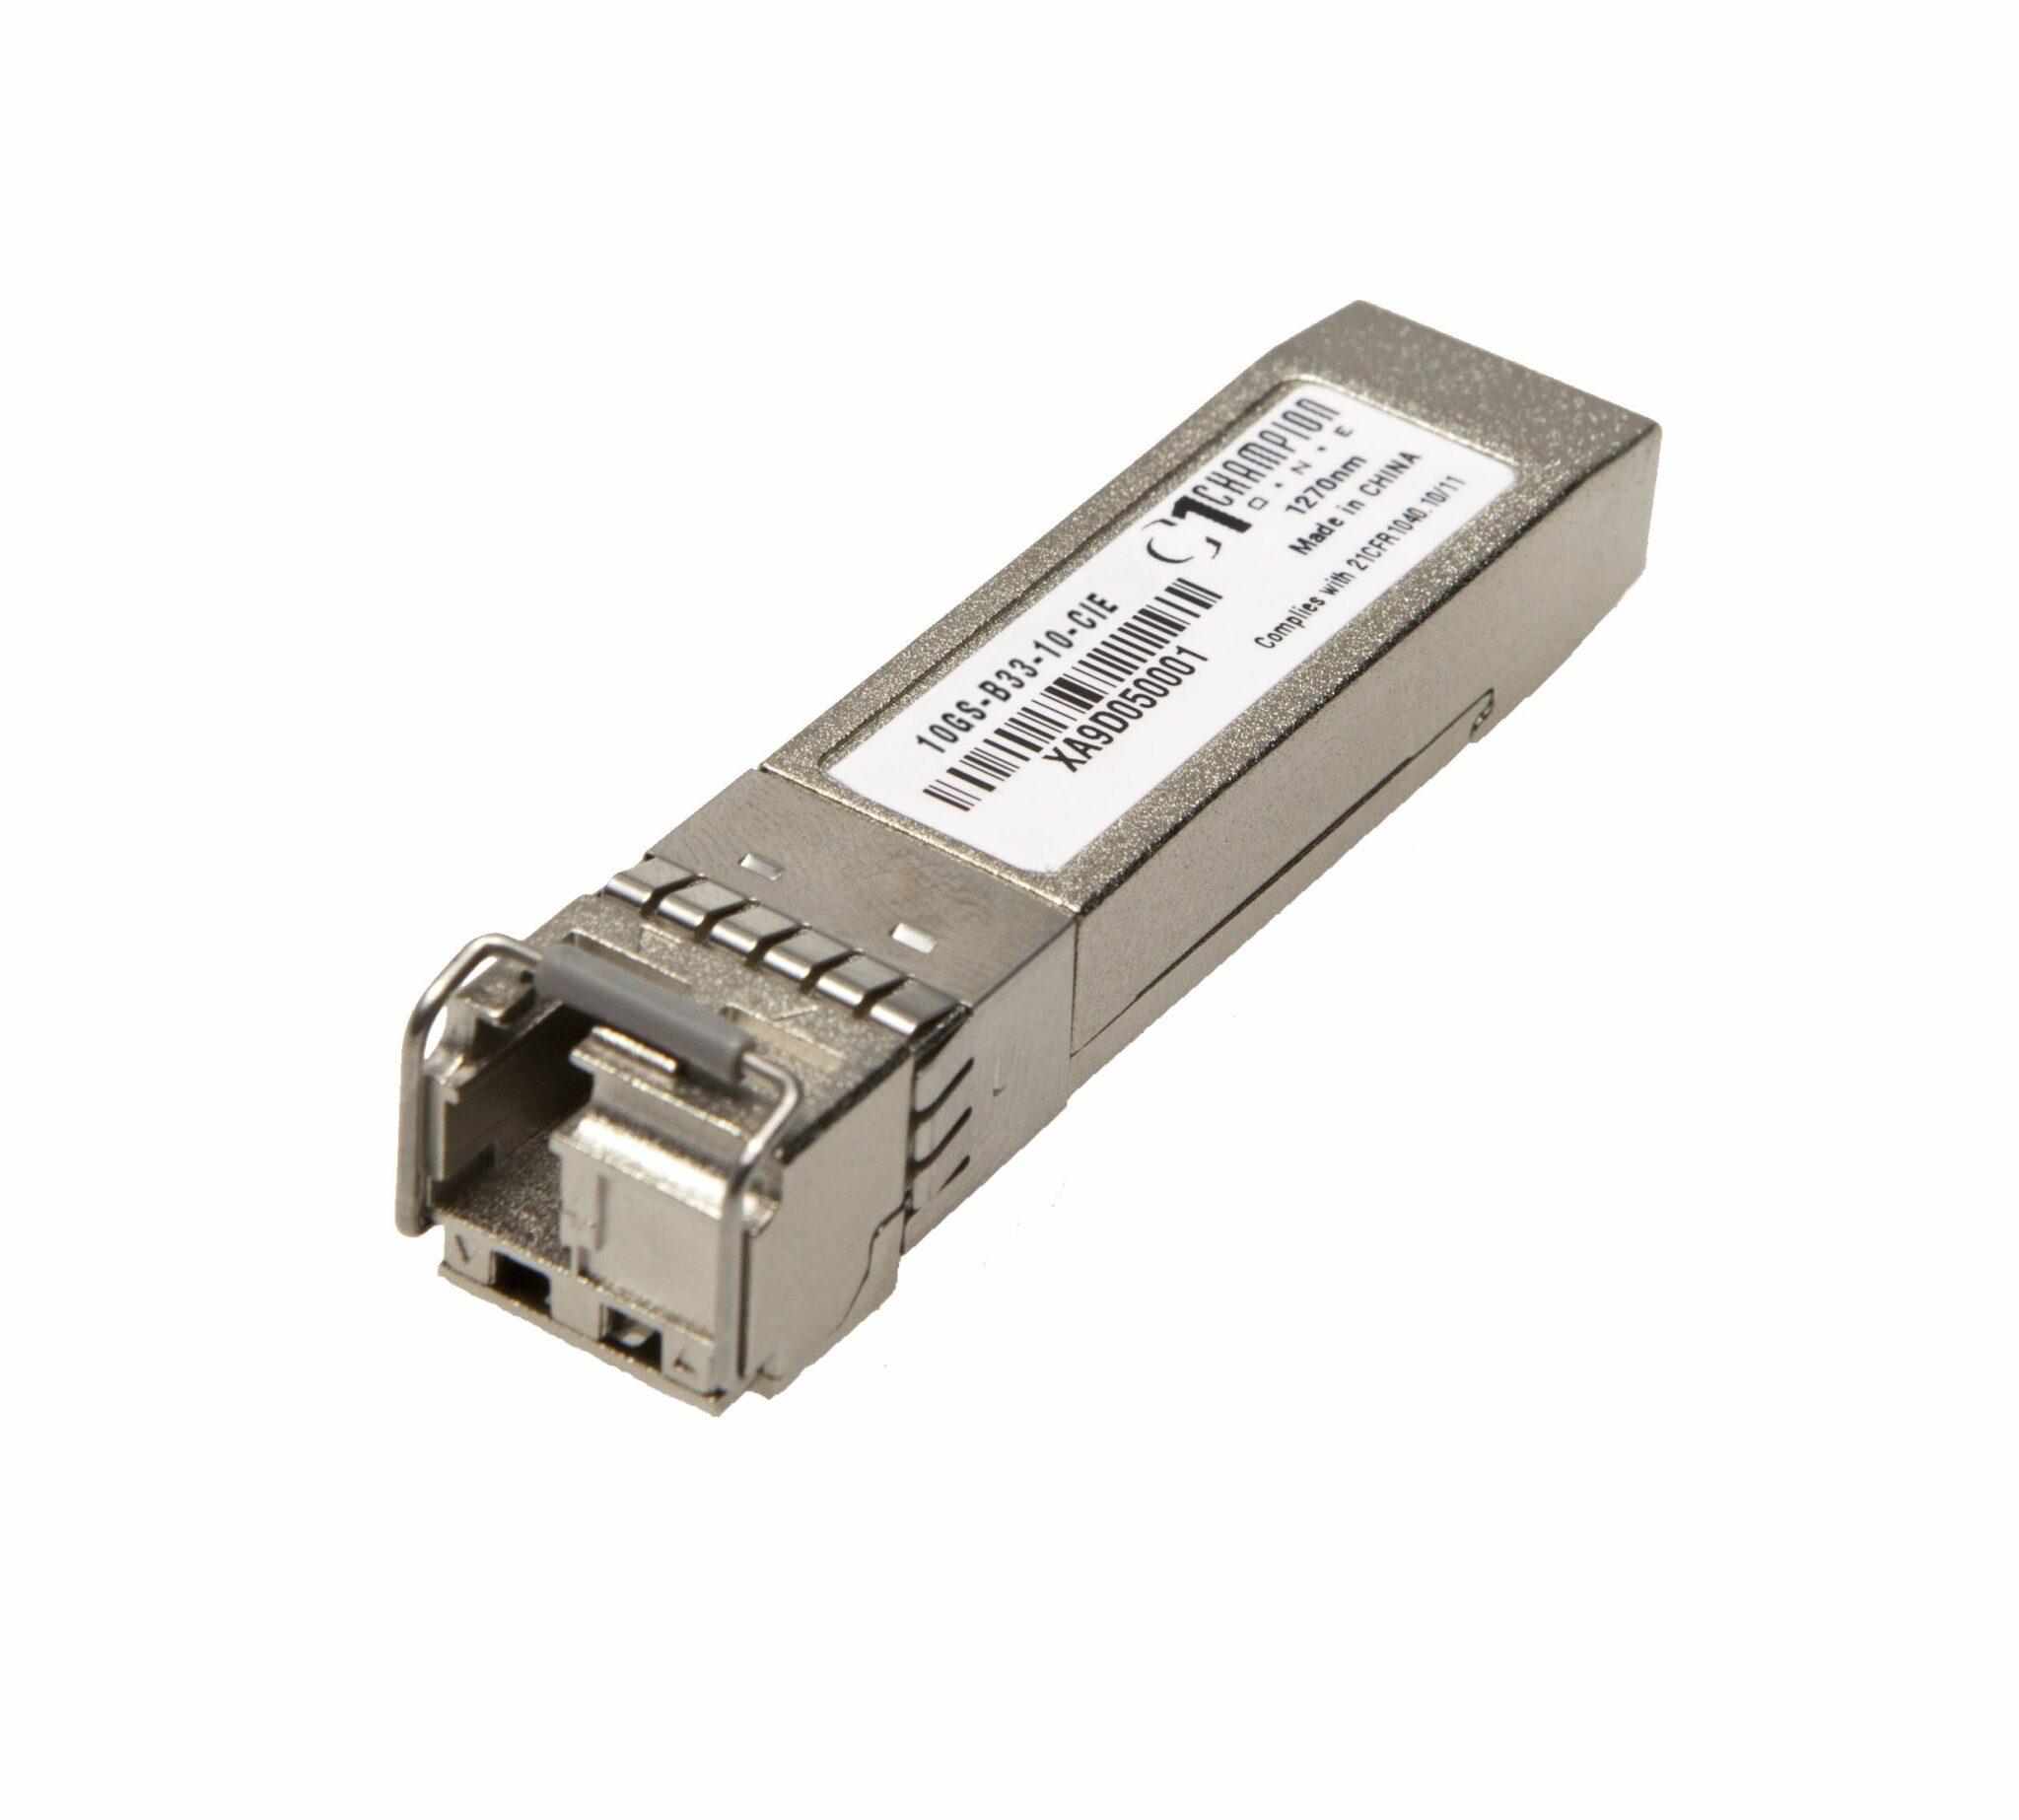 SFP+ SF 10GBase-LR 1330nm 10km, Ciena compatible